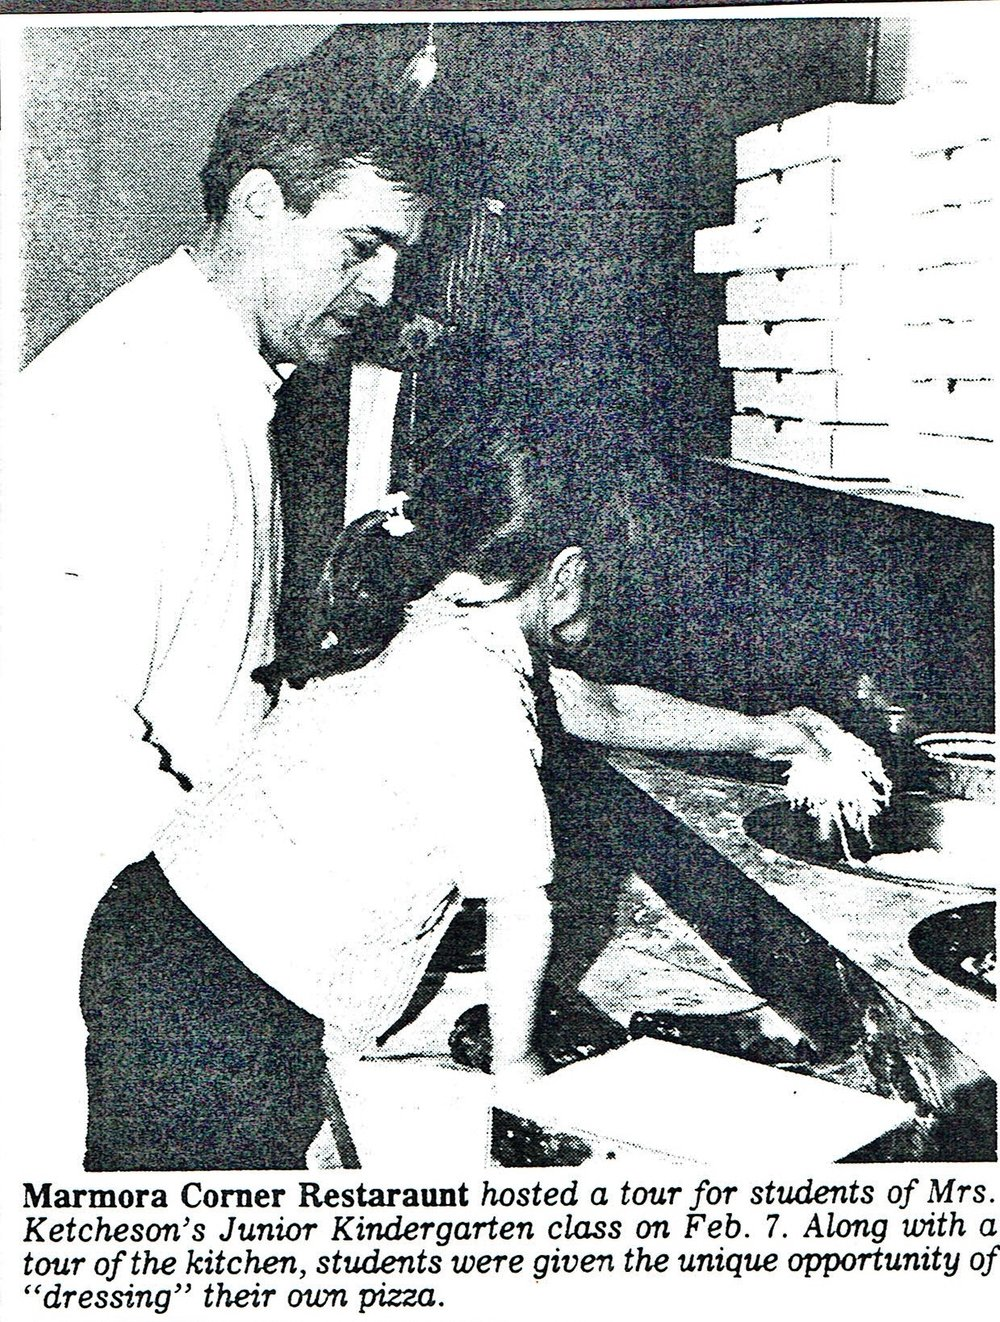 Bill Kourukis